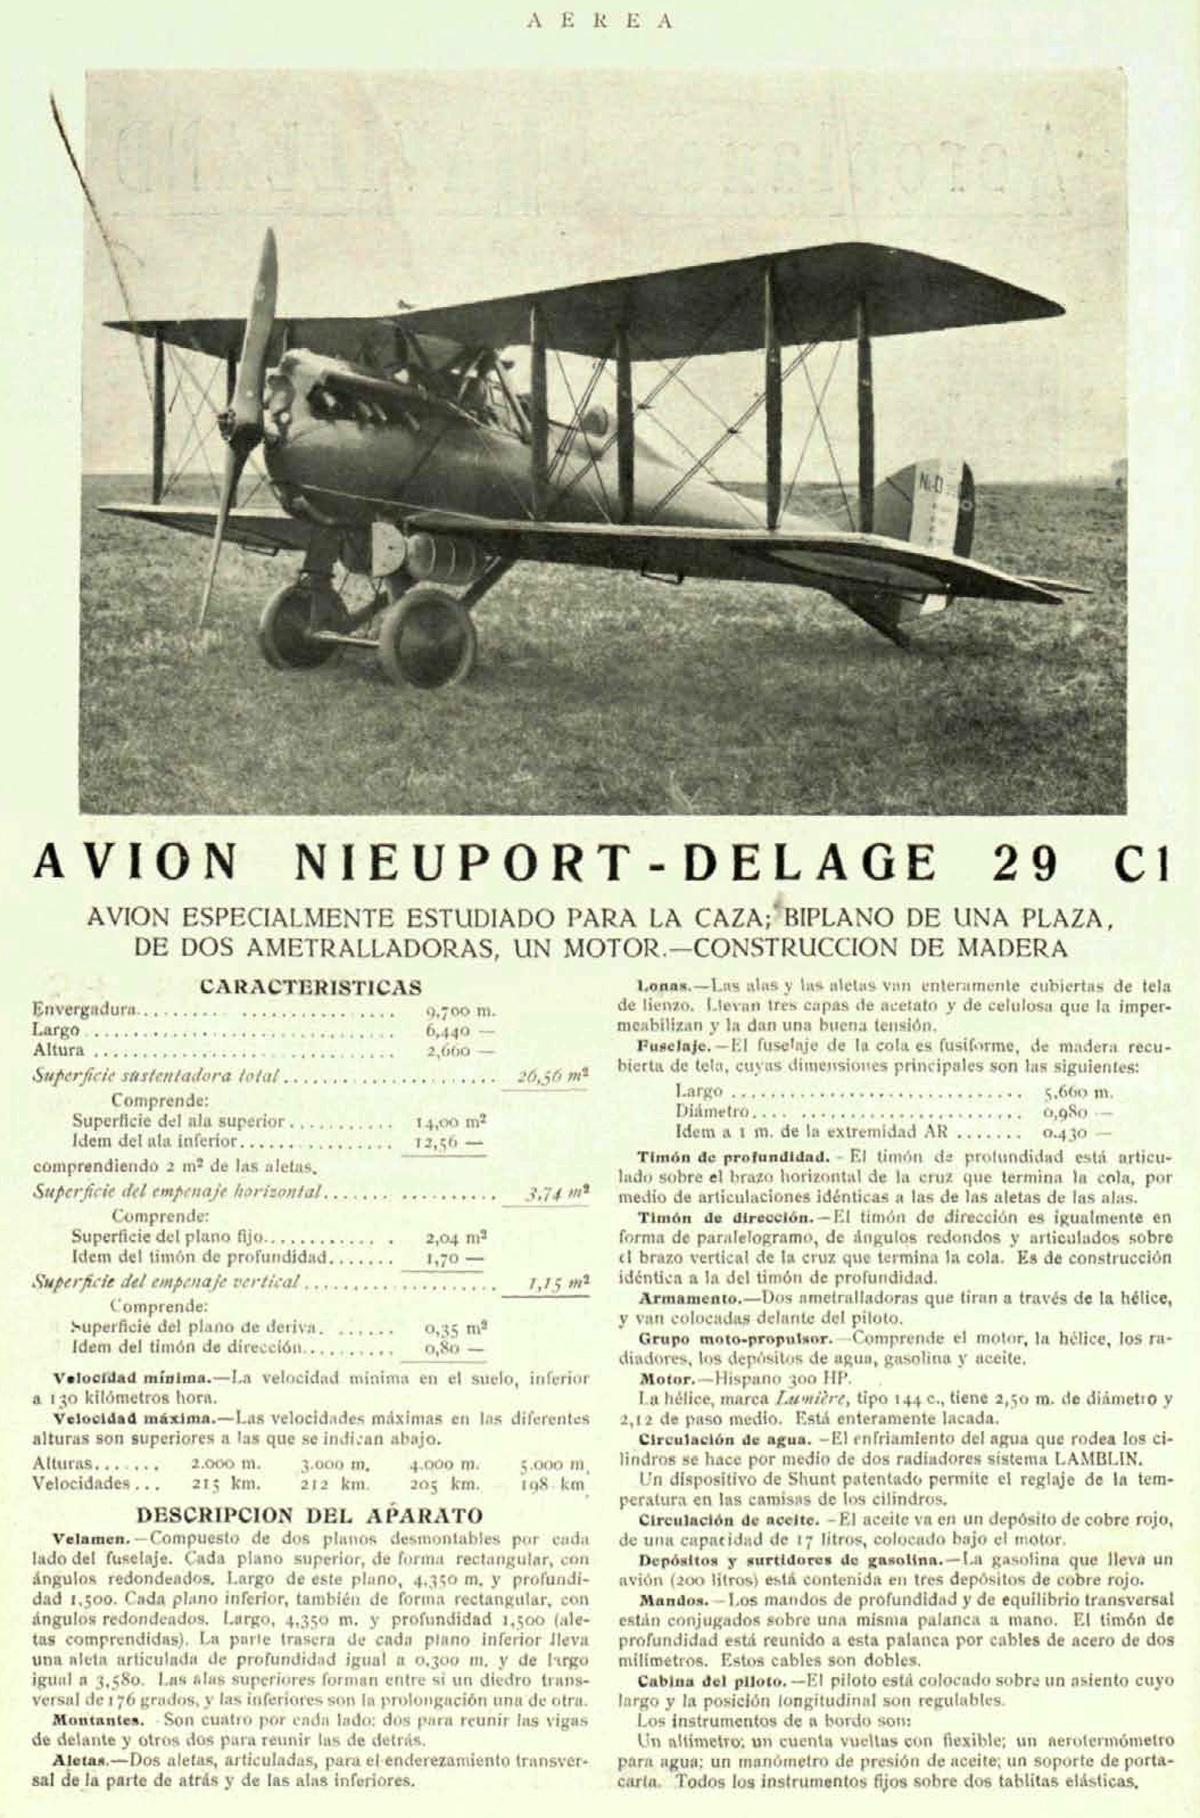 Avión Nieuport-Delage 29